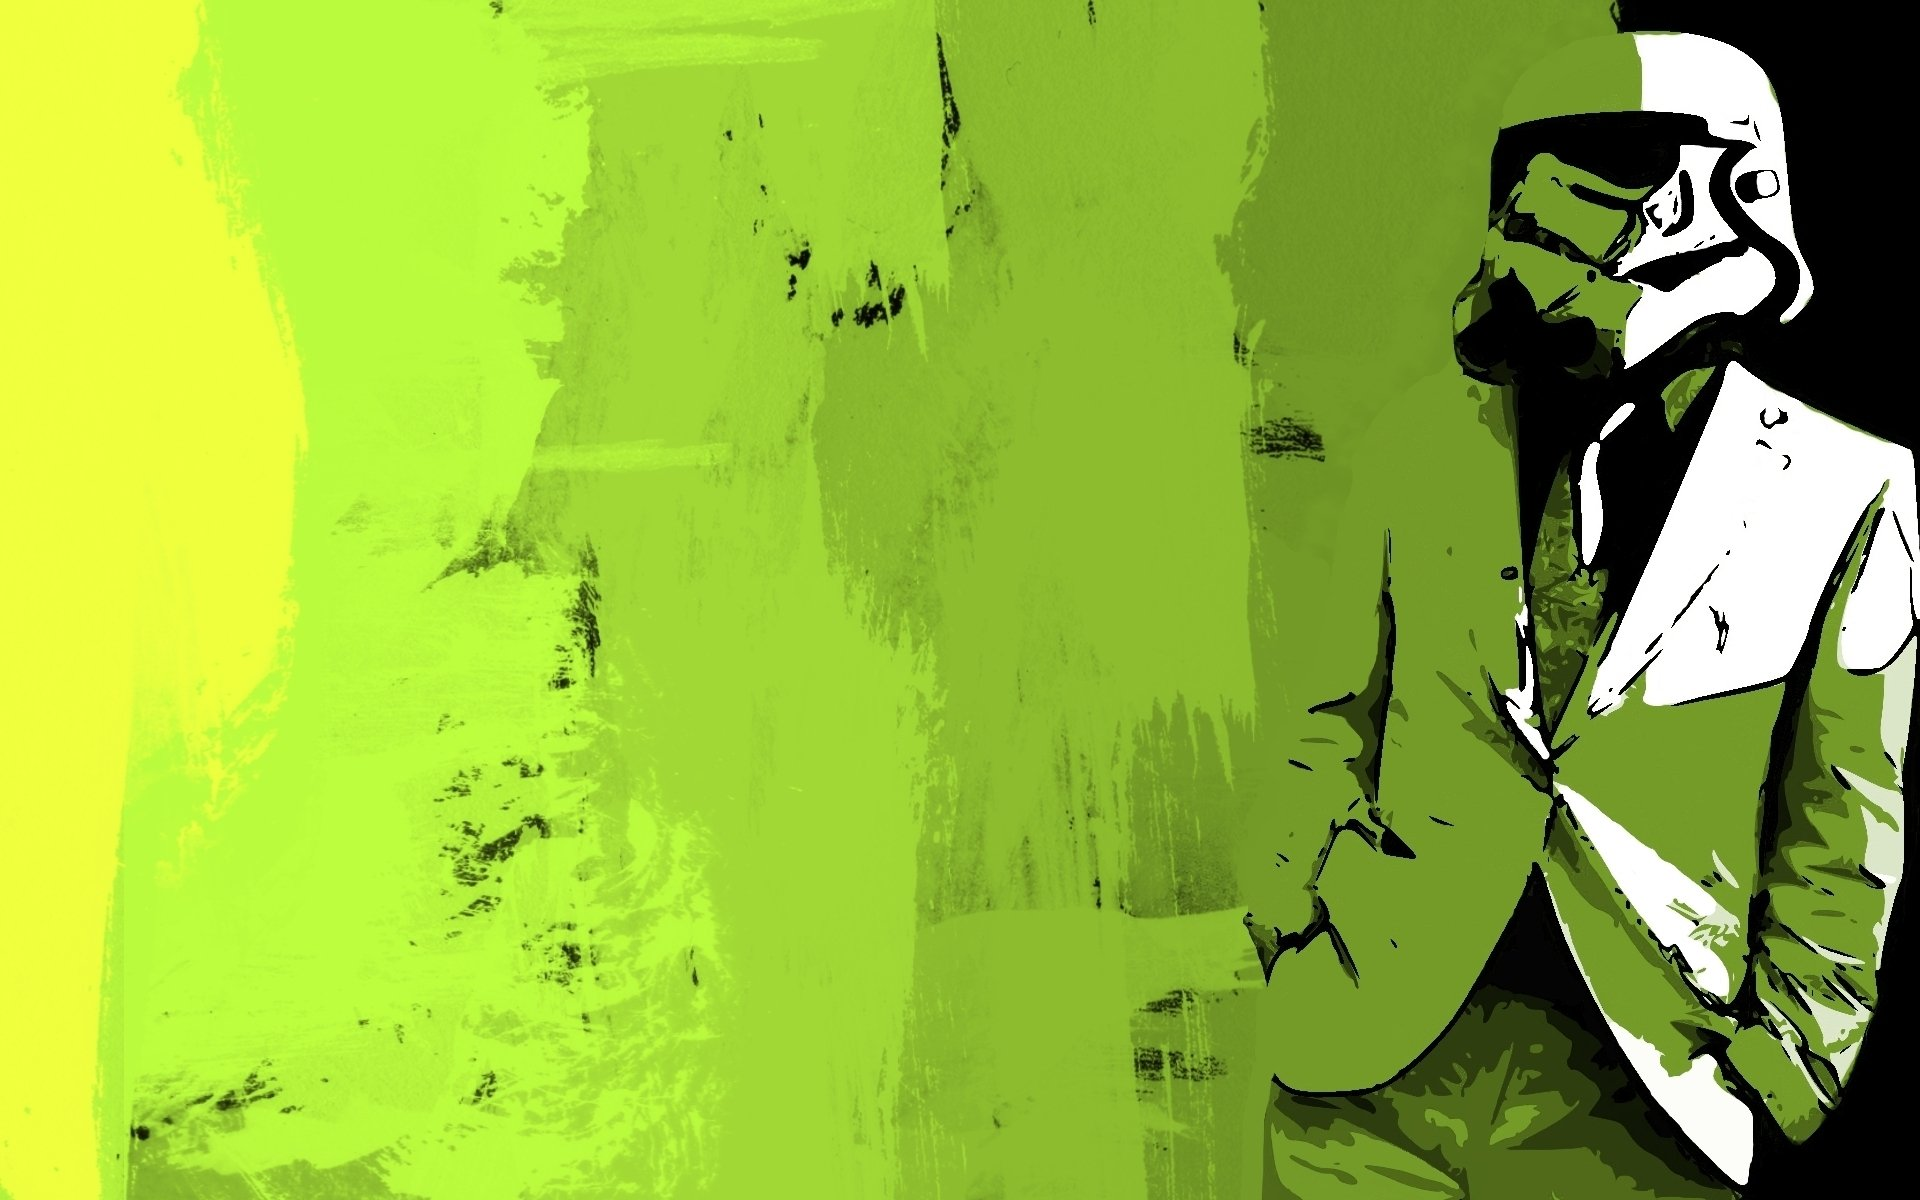 Star Wars Hd Wallpaper Background Image 1920x1200 Id 287846 Wallpaper Abyss